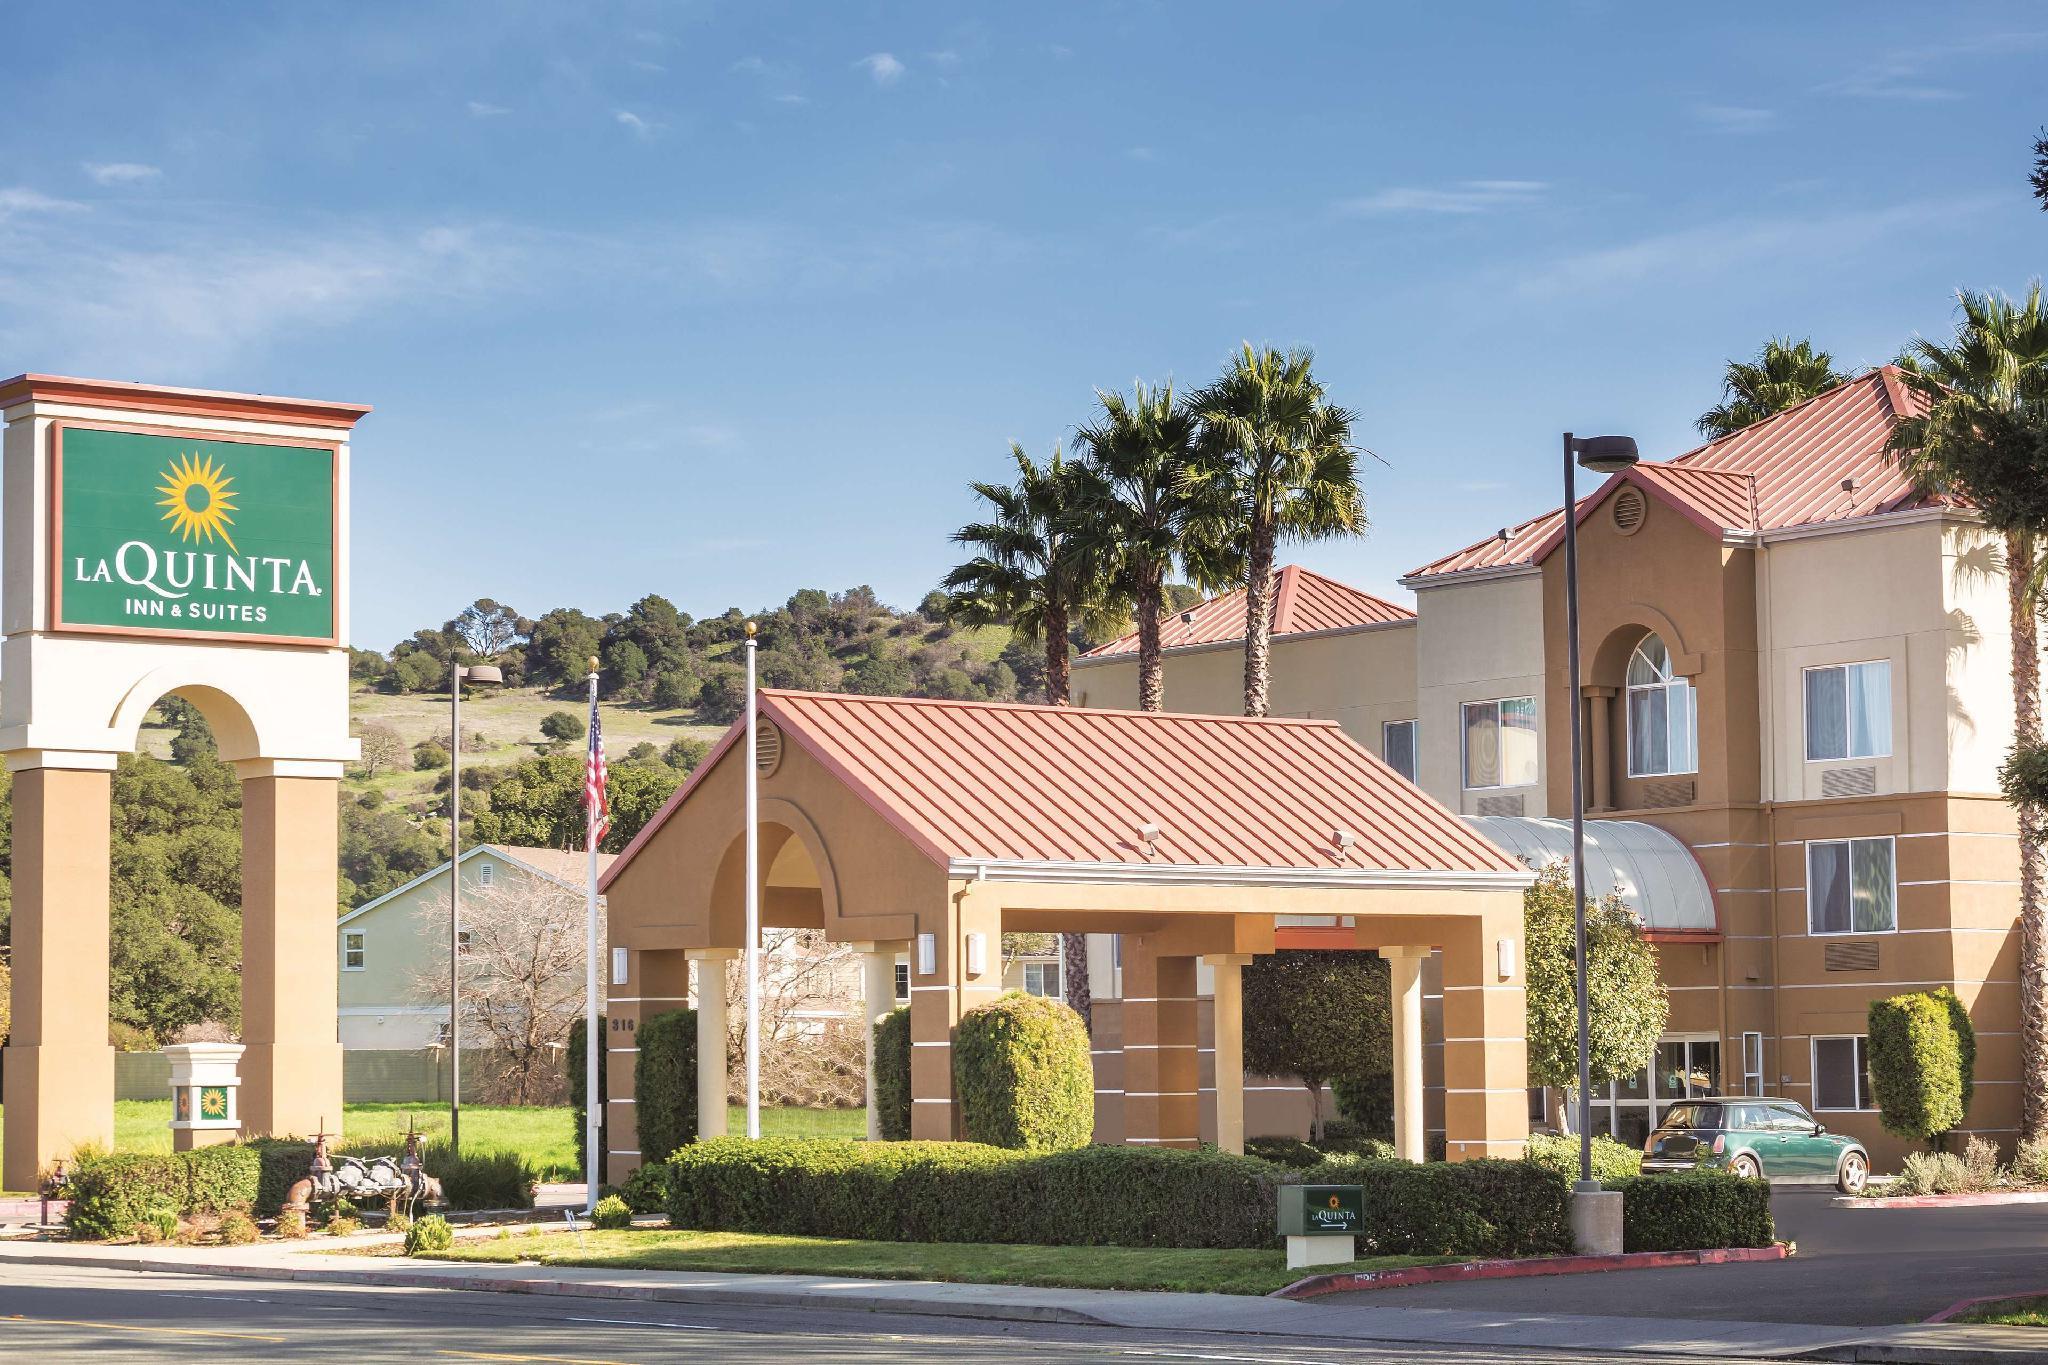 La Quinta Inn And Suites By Wyndham Fairfield   Napa Valley